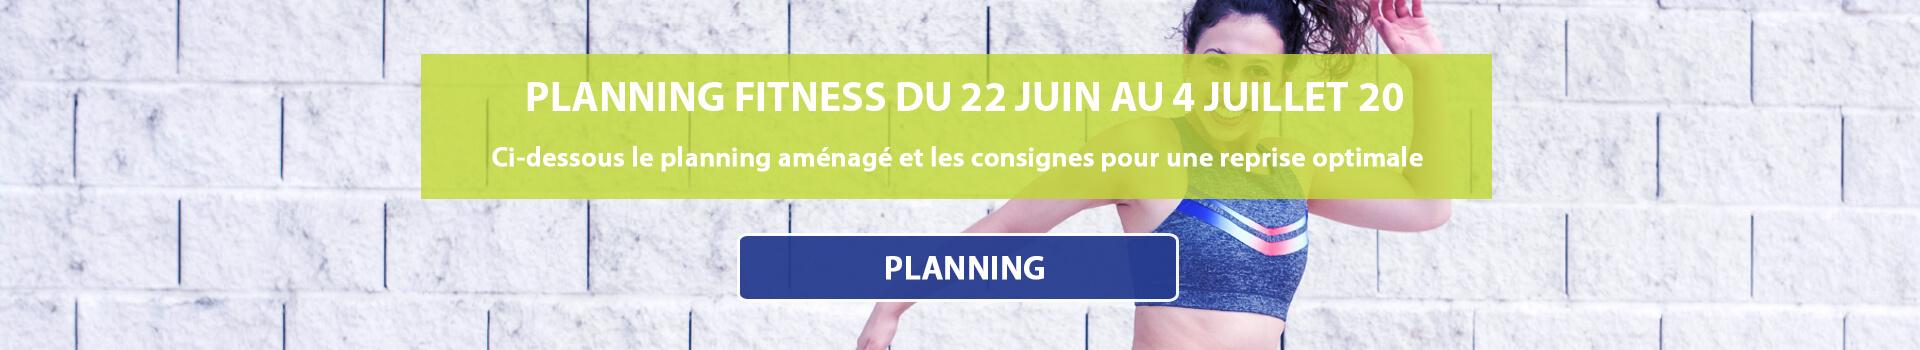 bandeau_PLANNING-FITNESS_-DU-22-JUIN-AU-3-JUILLET_19-20